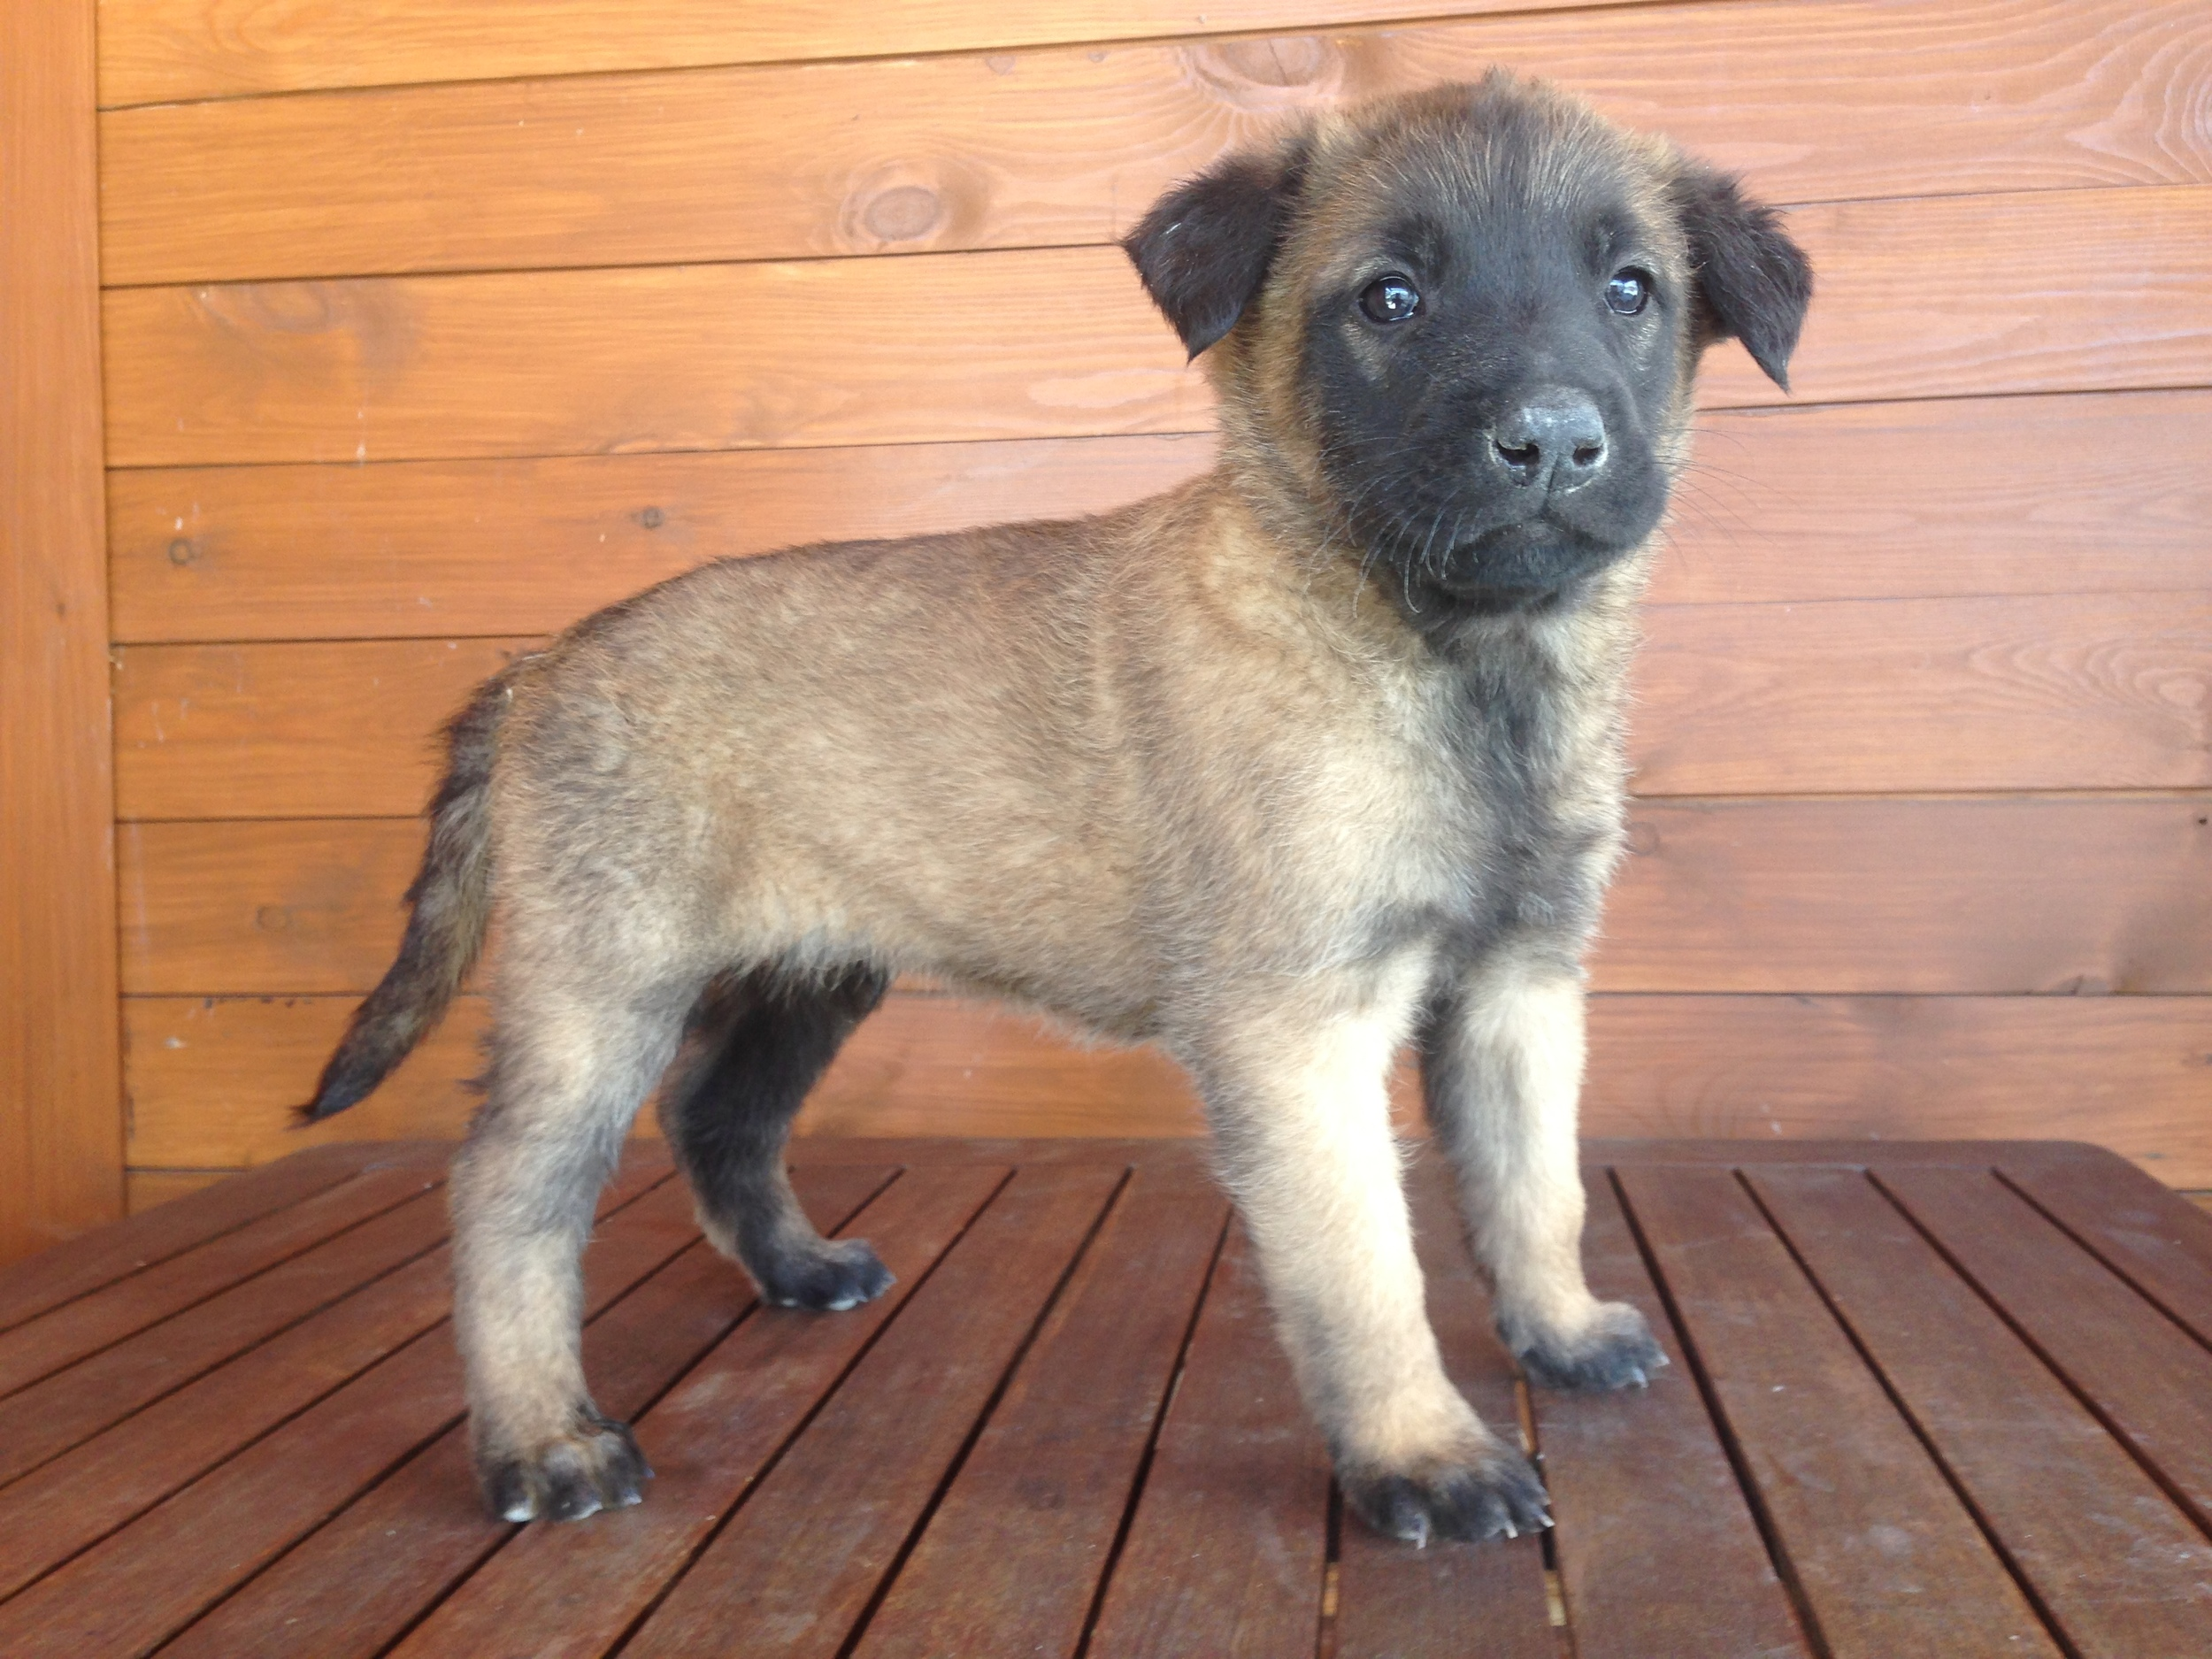 Male puppy #2